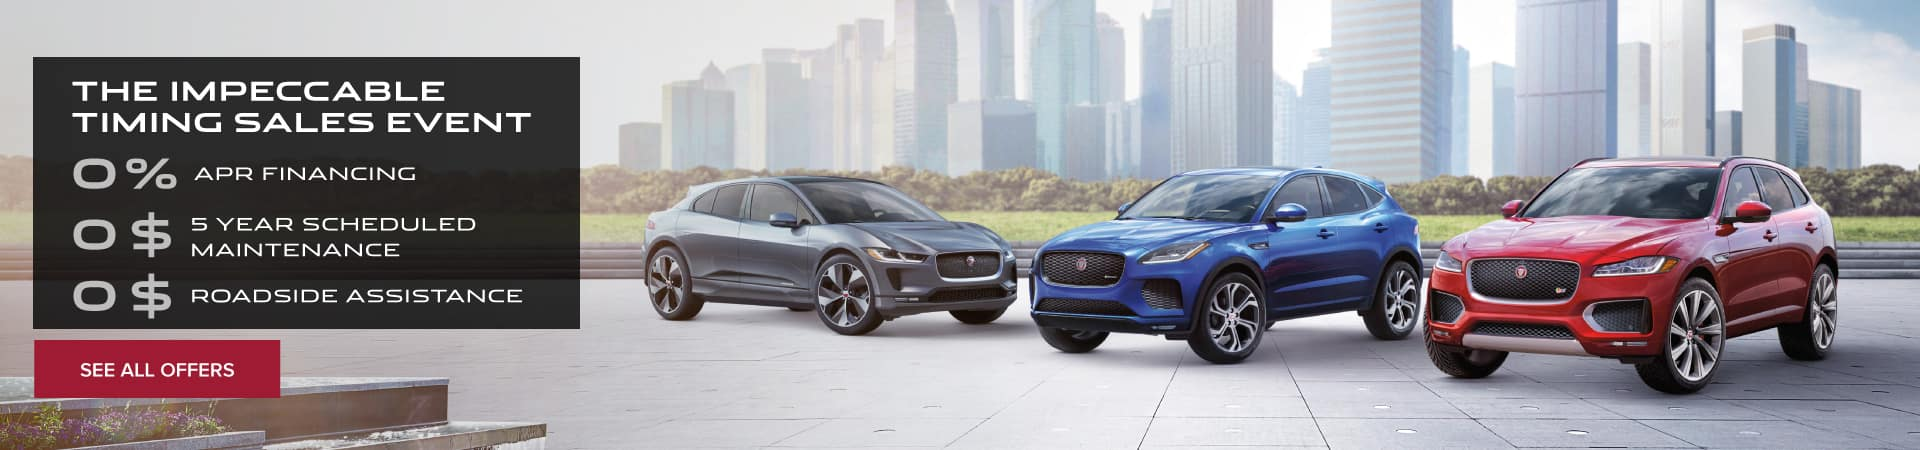 Autobahn Jaguar Fort Worth   Impeccable Timing Sales Event